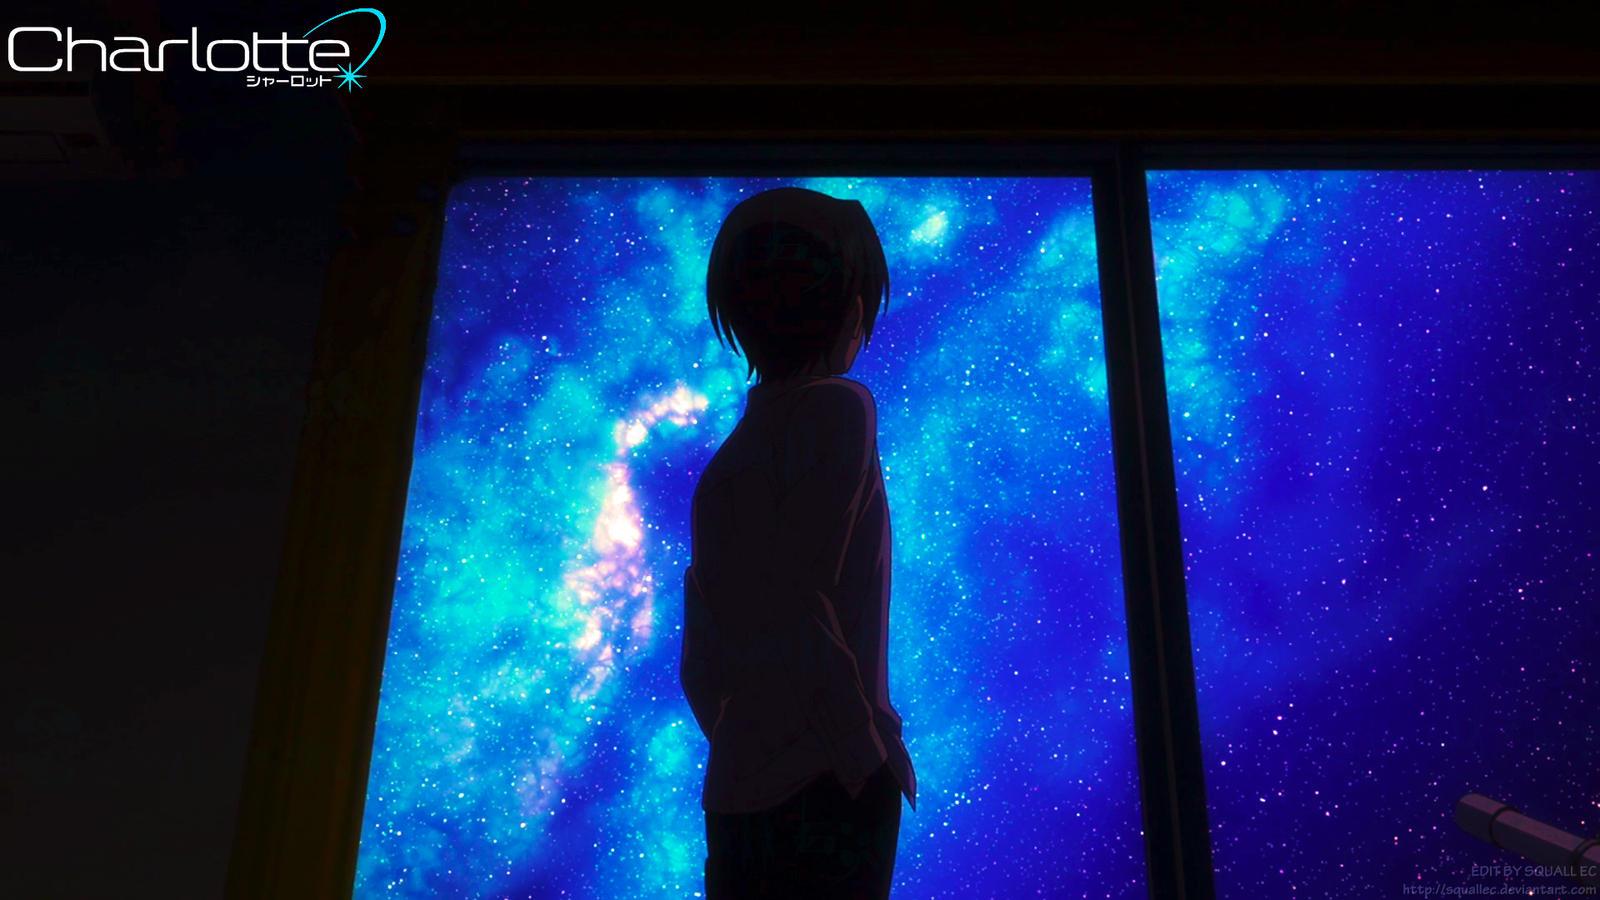 Gaze upon the stars